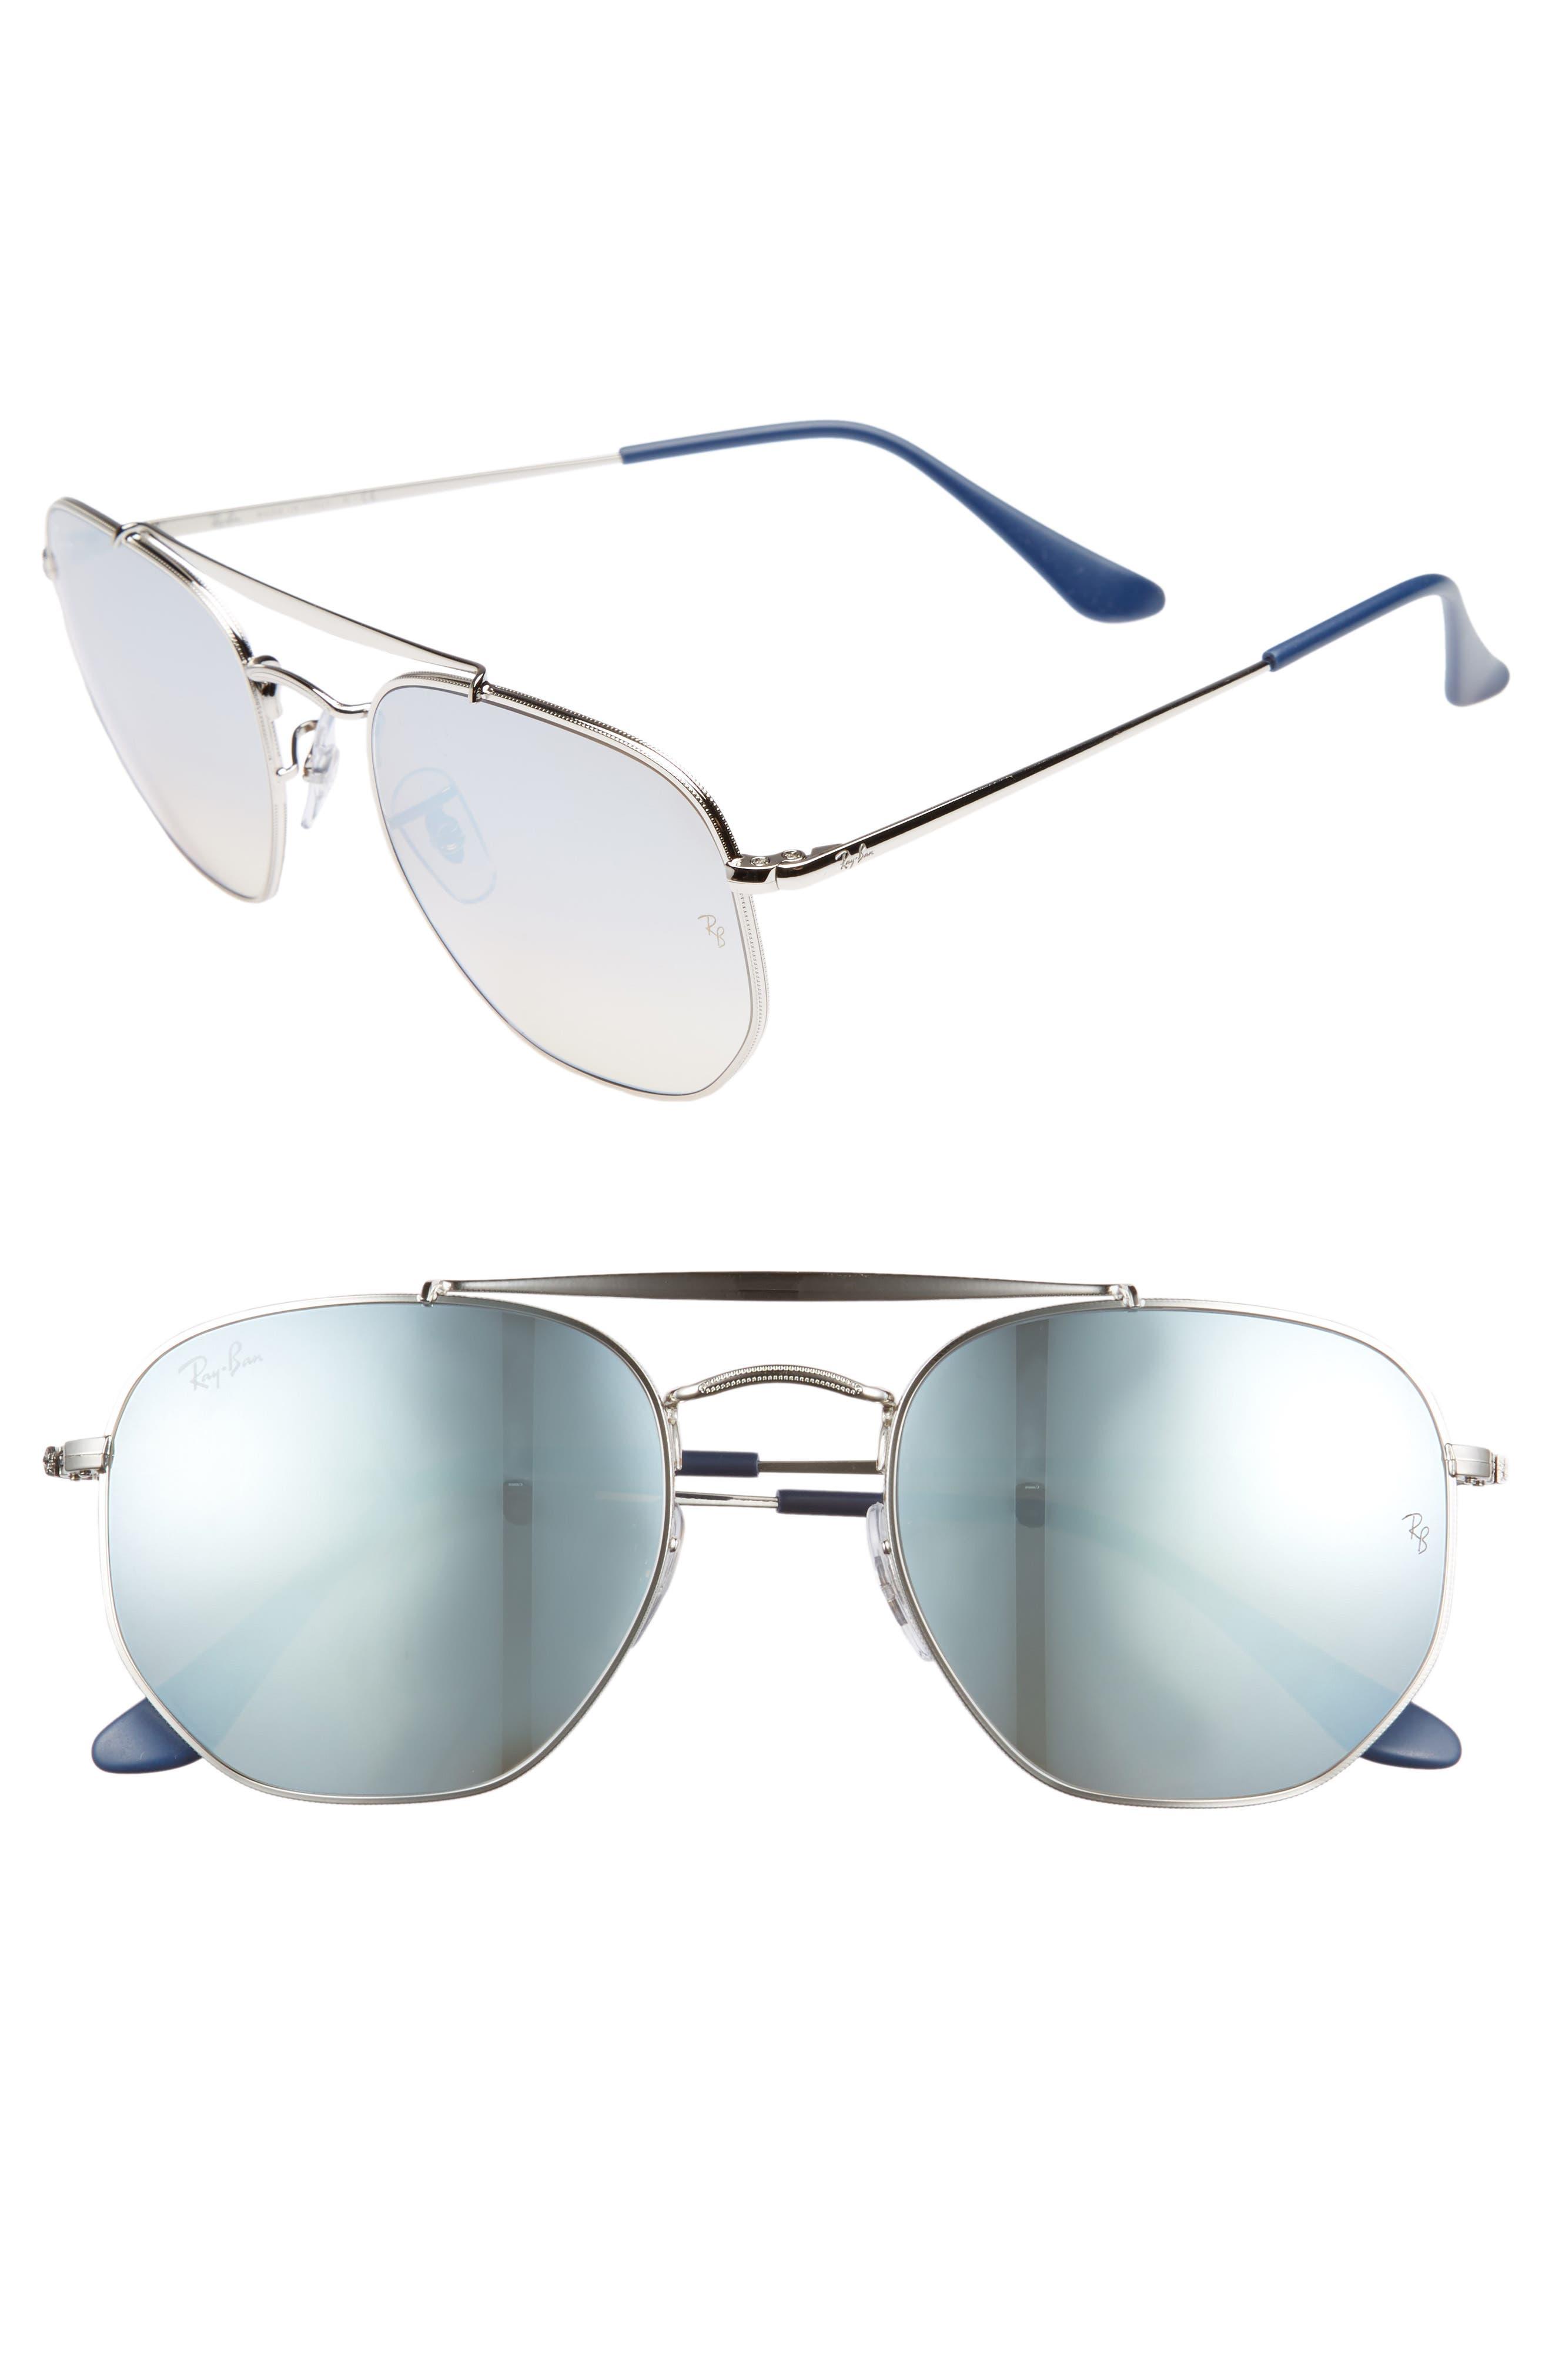 Marshal 54mm Aviator Sunglasses,                         Main,                         color, Silver/ Mirror